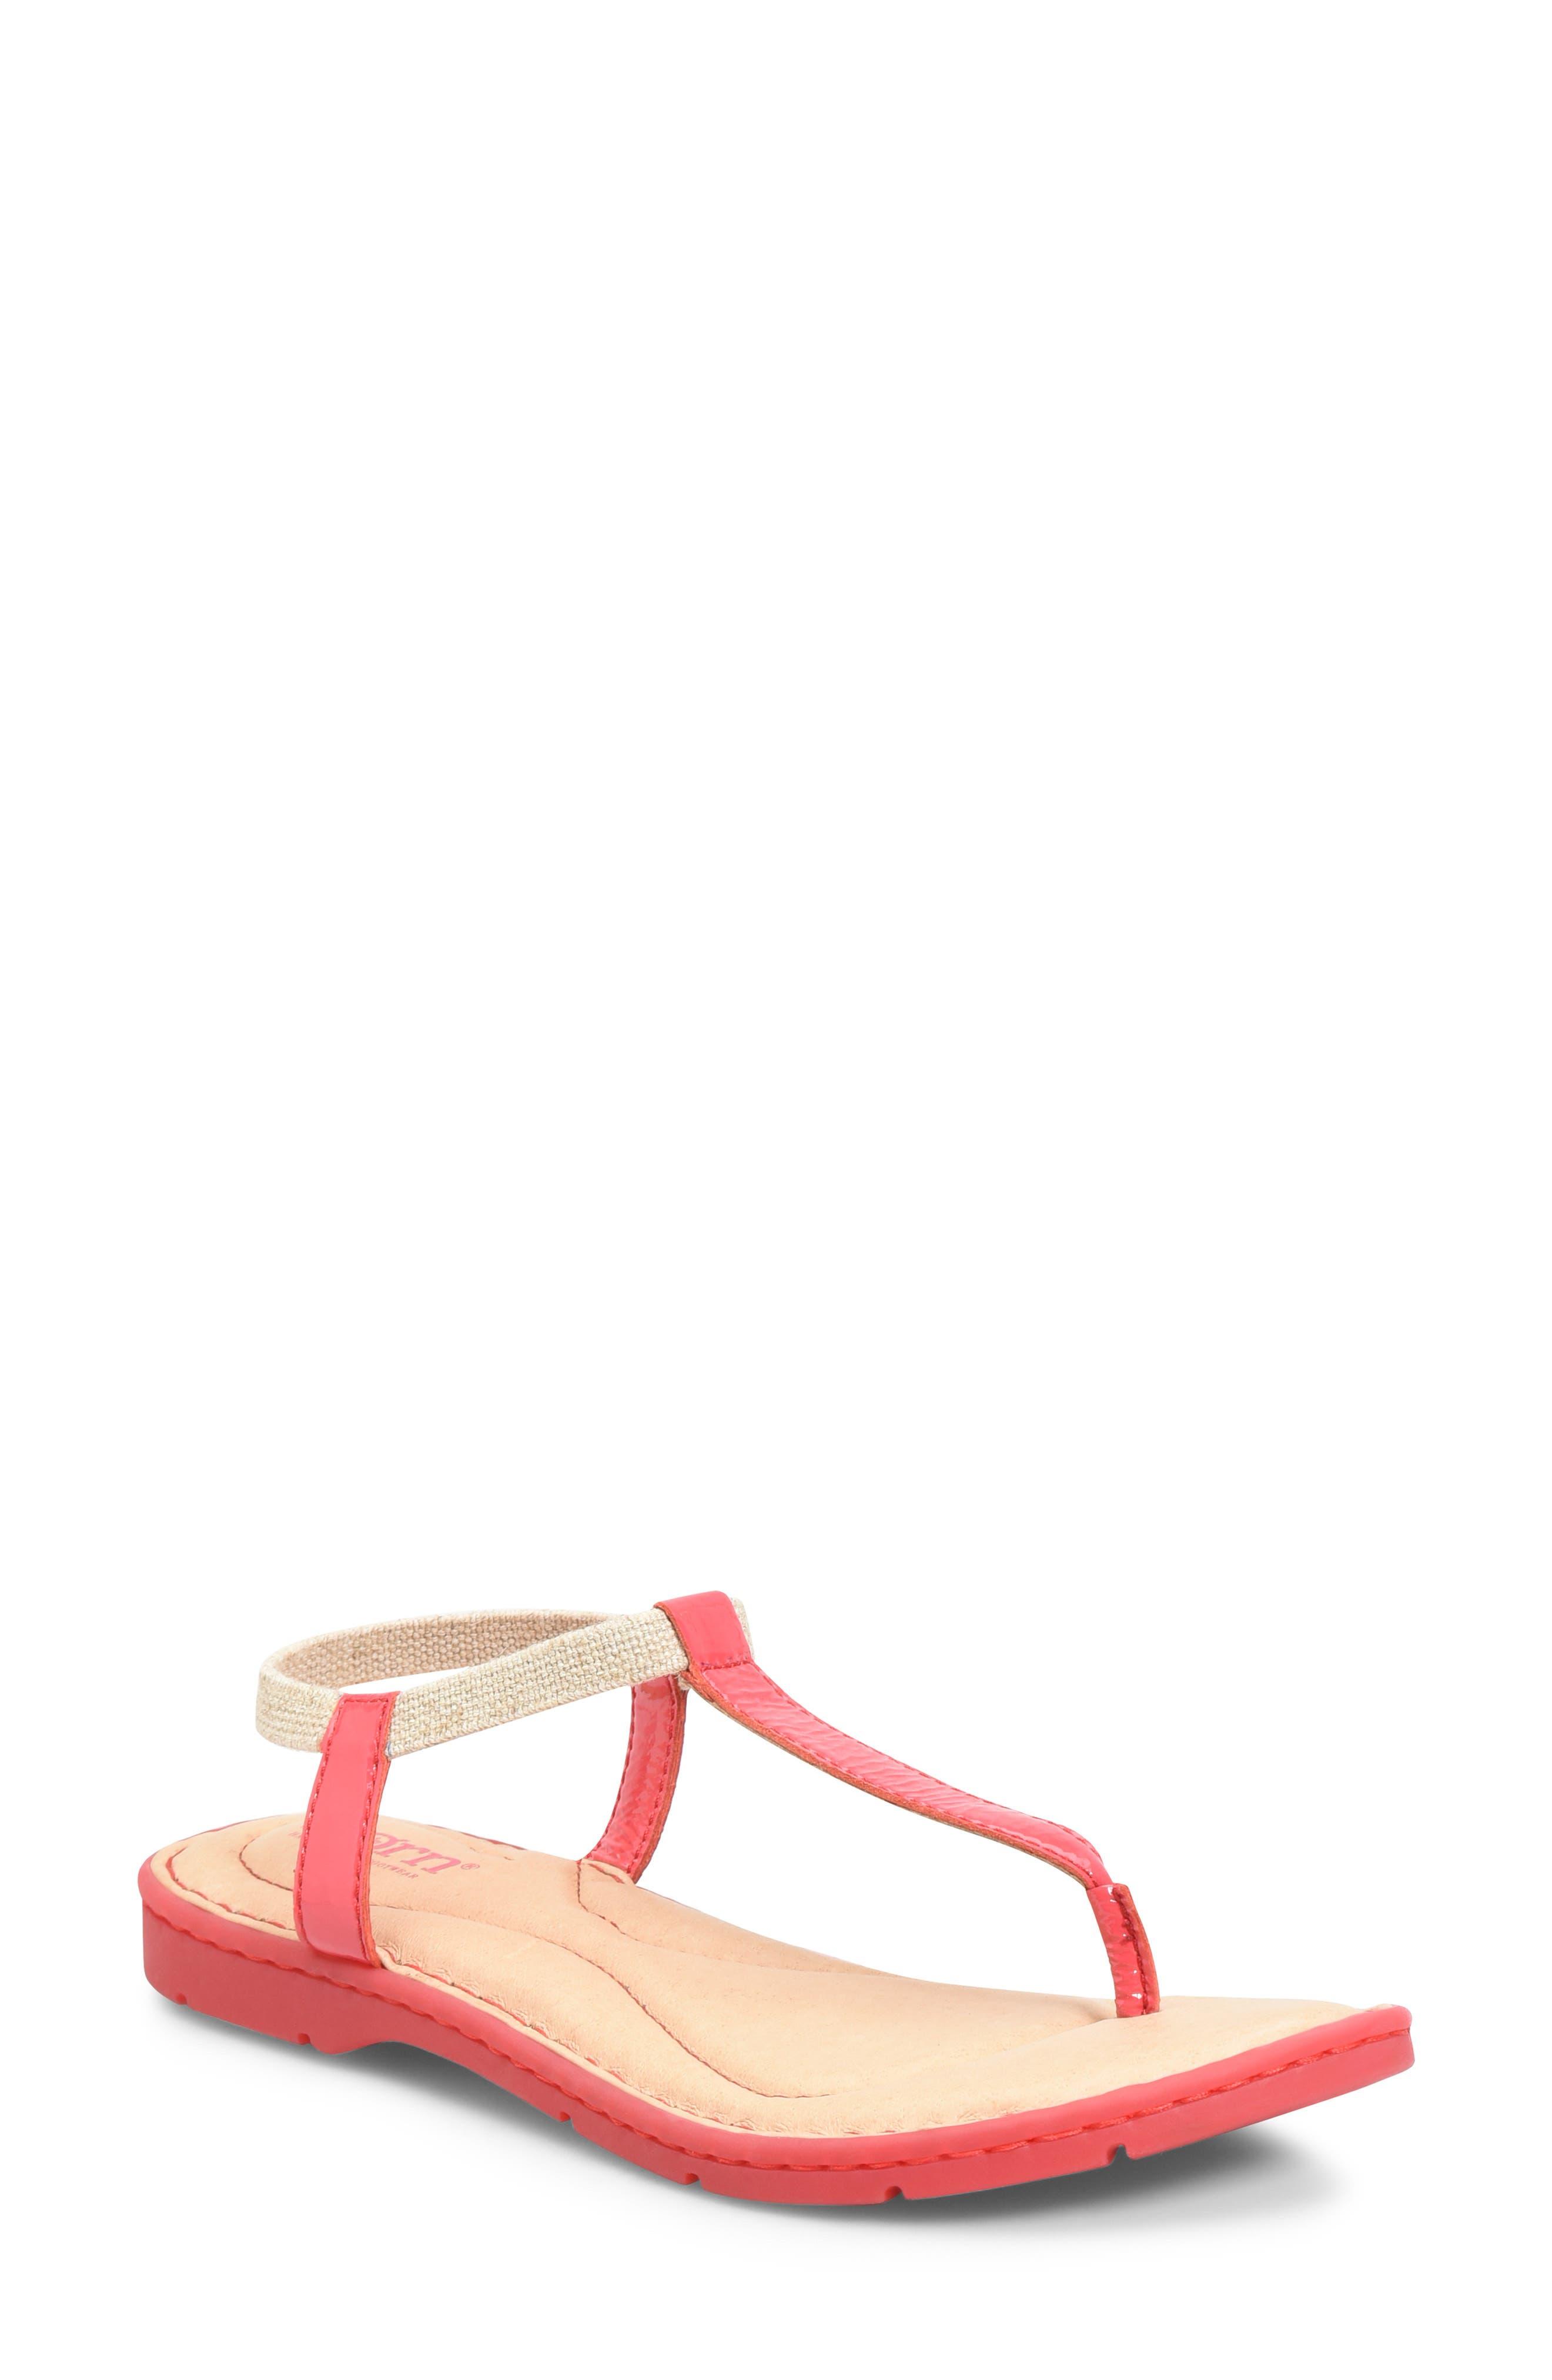 B?rn Trinity T-Strap Sandal, Red